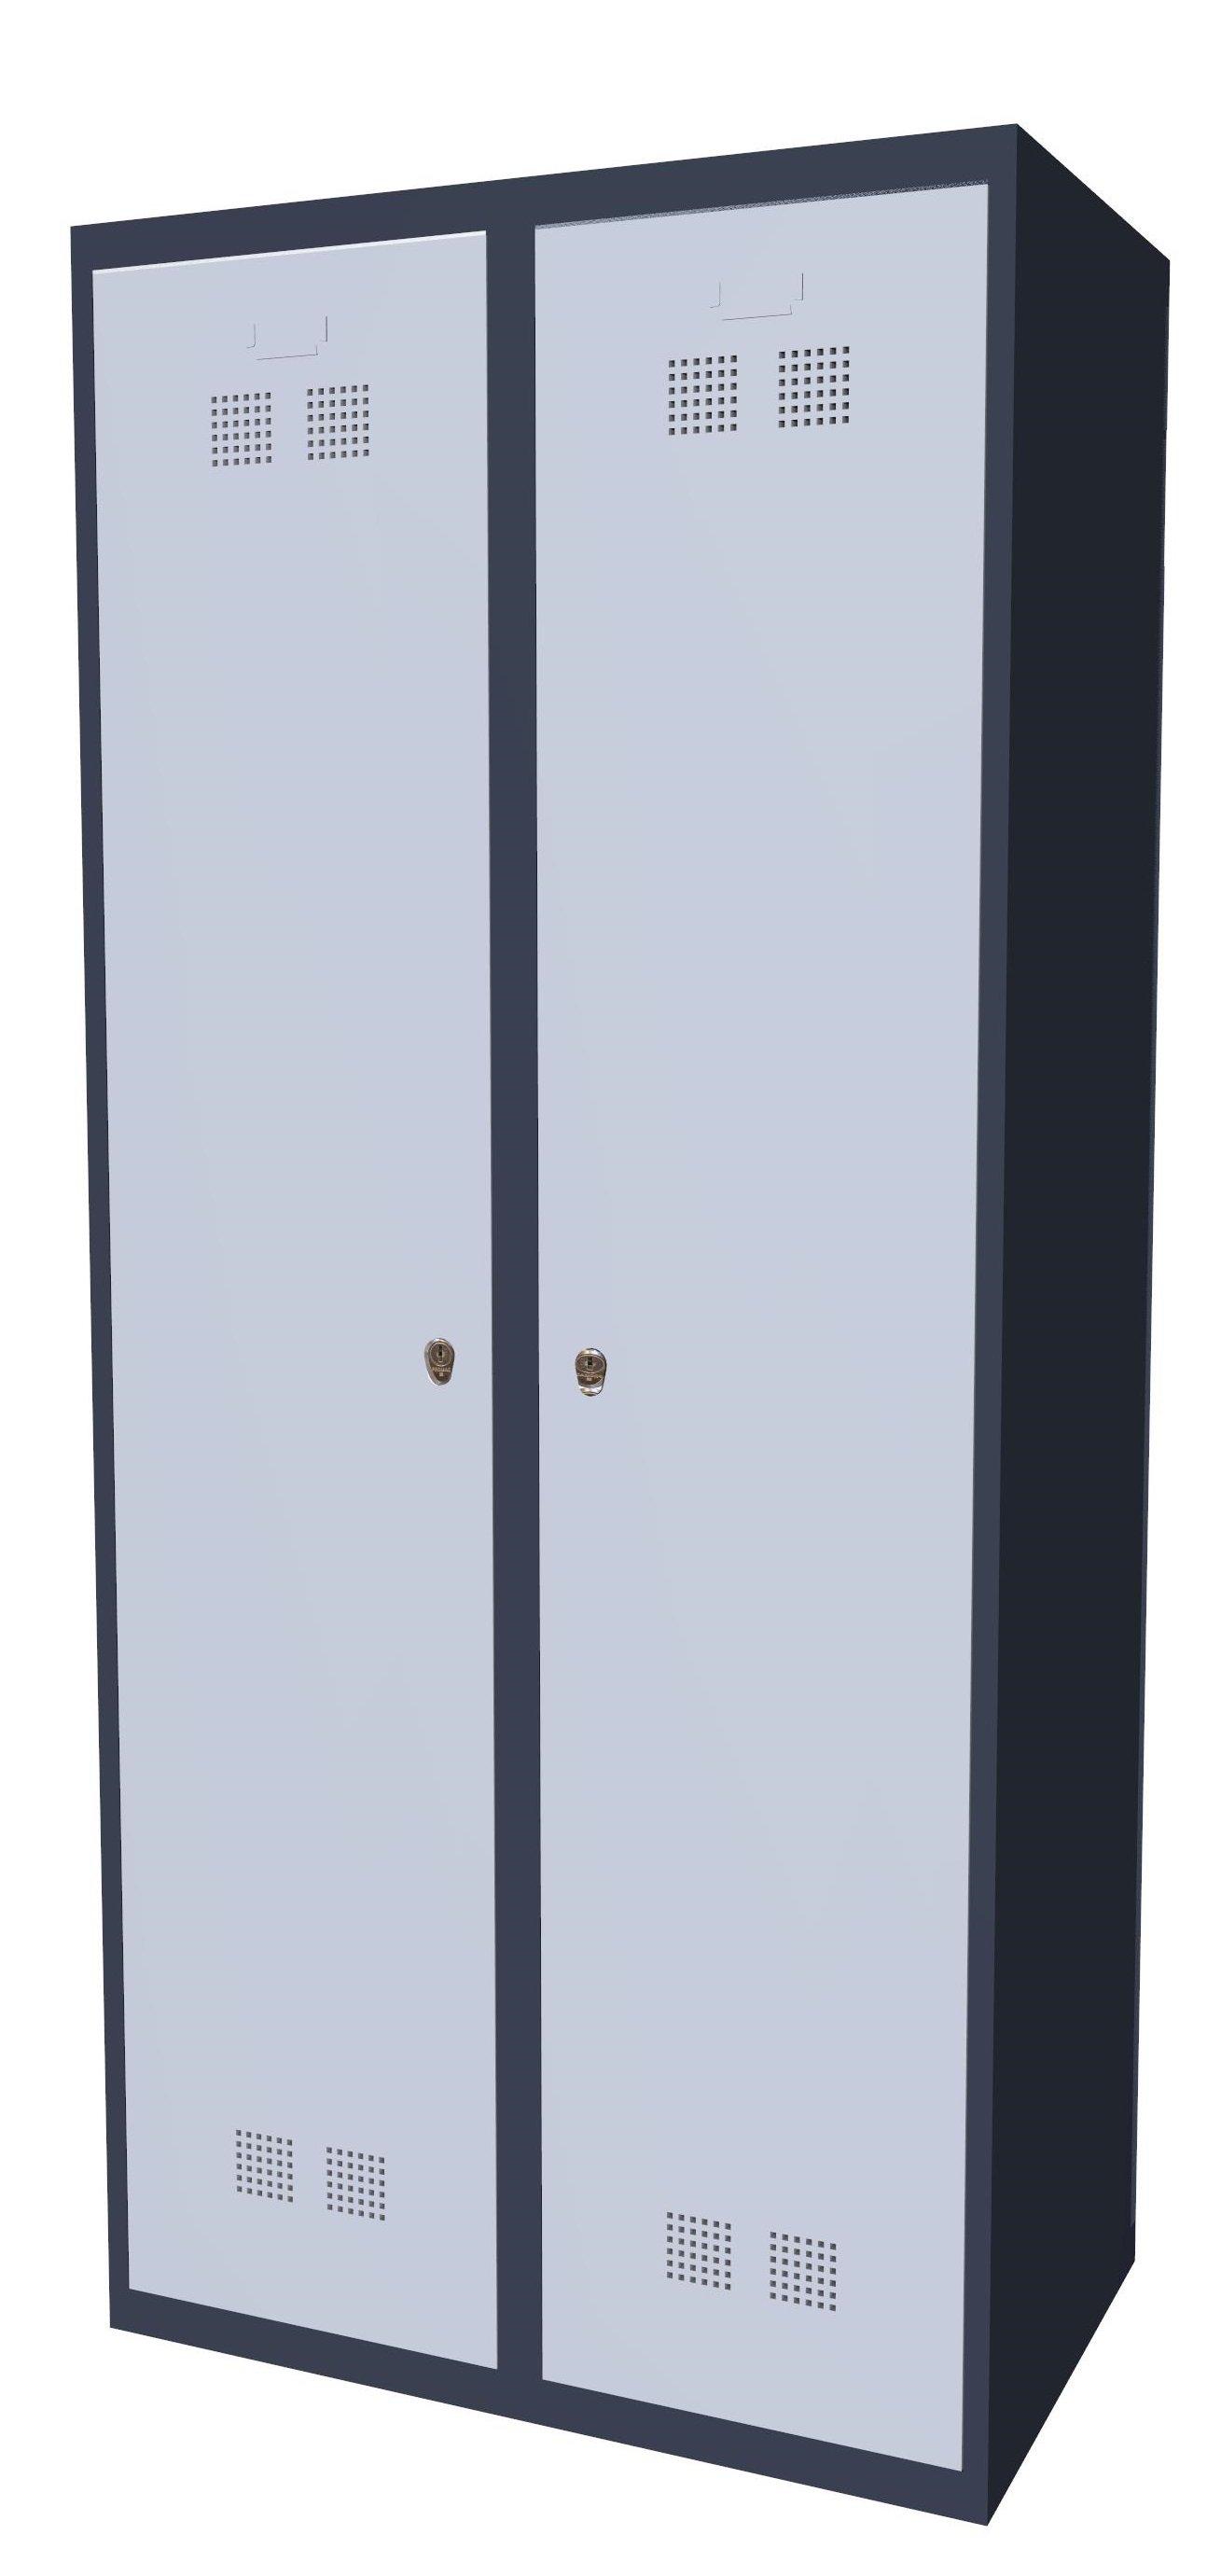 Szafka ubraniowa pracownicza SUP E400-02 7024/7035